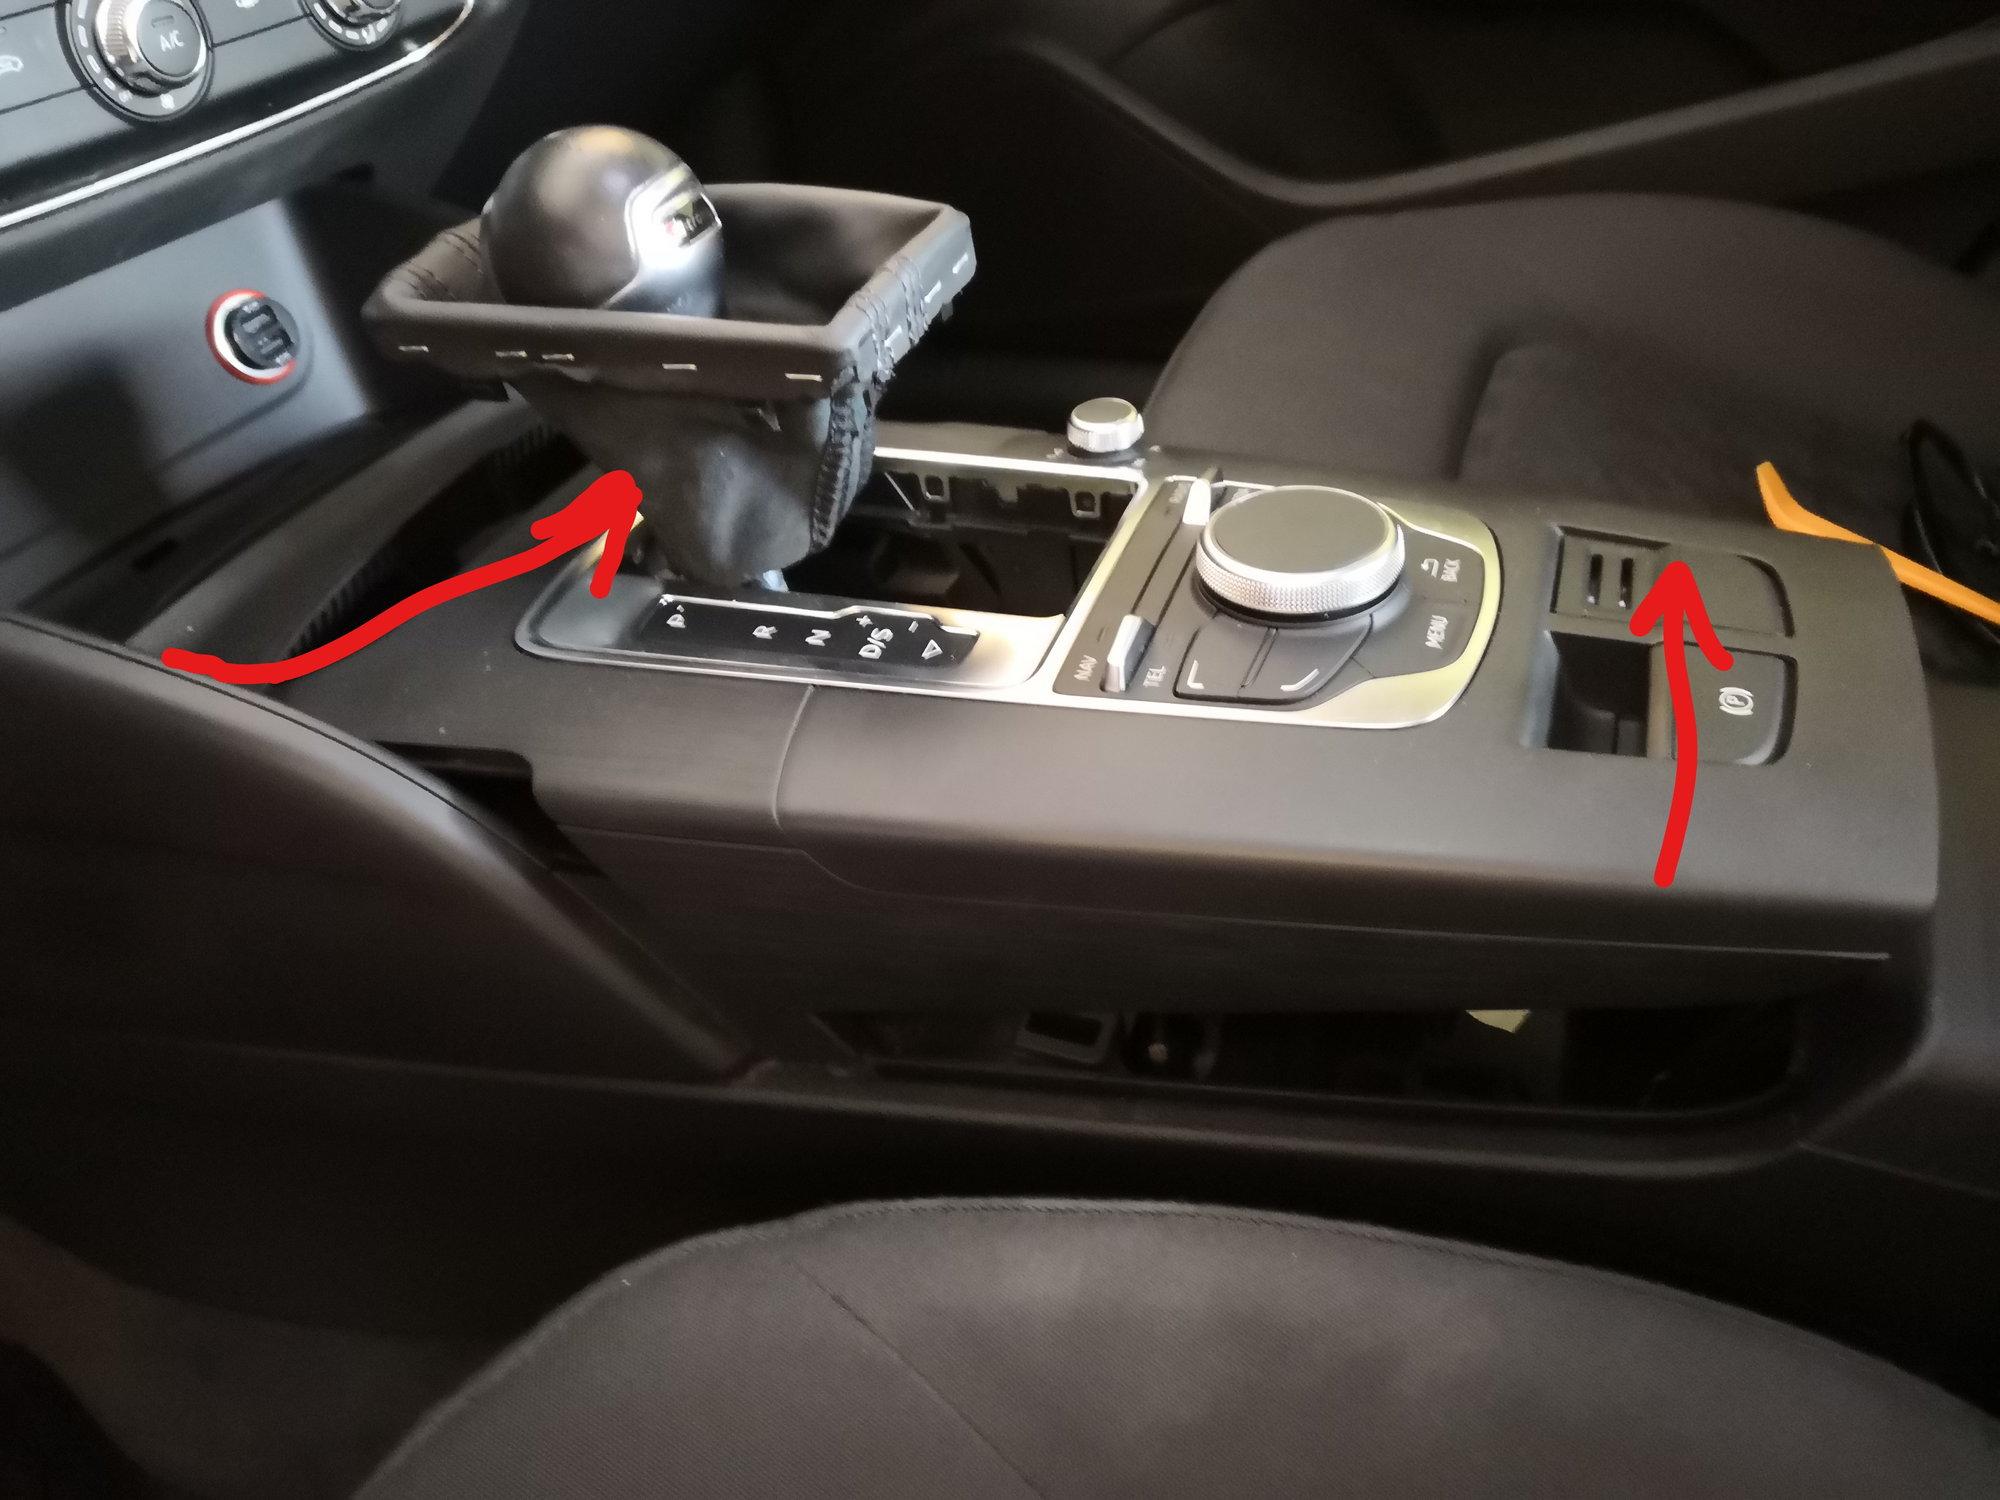 A3 8v Rear A C Vents Install Audiworld Forums